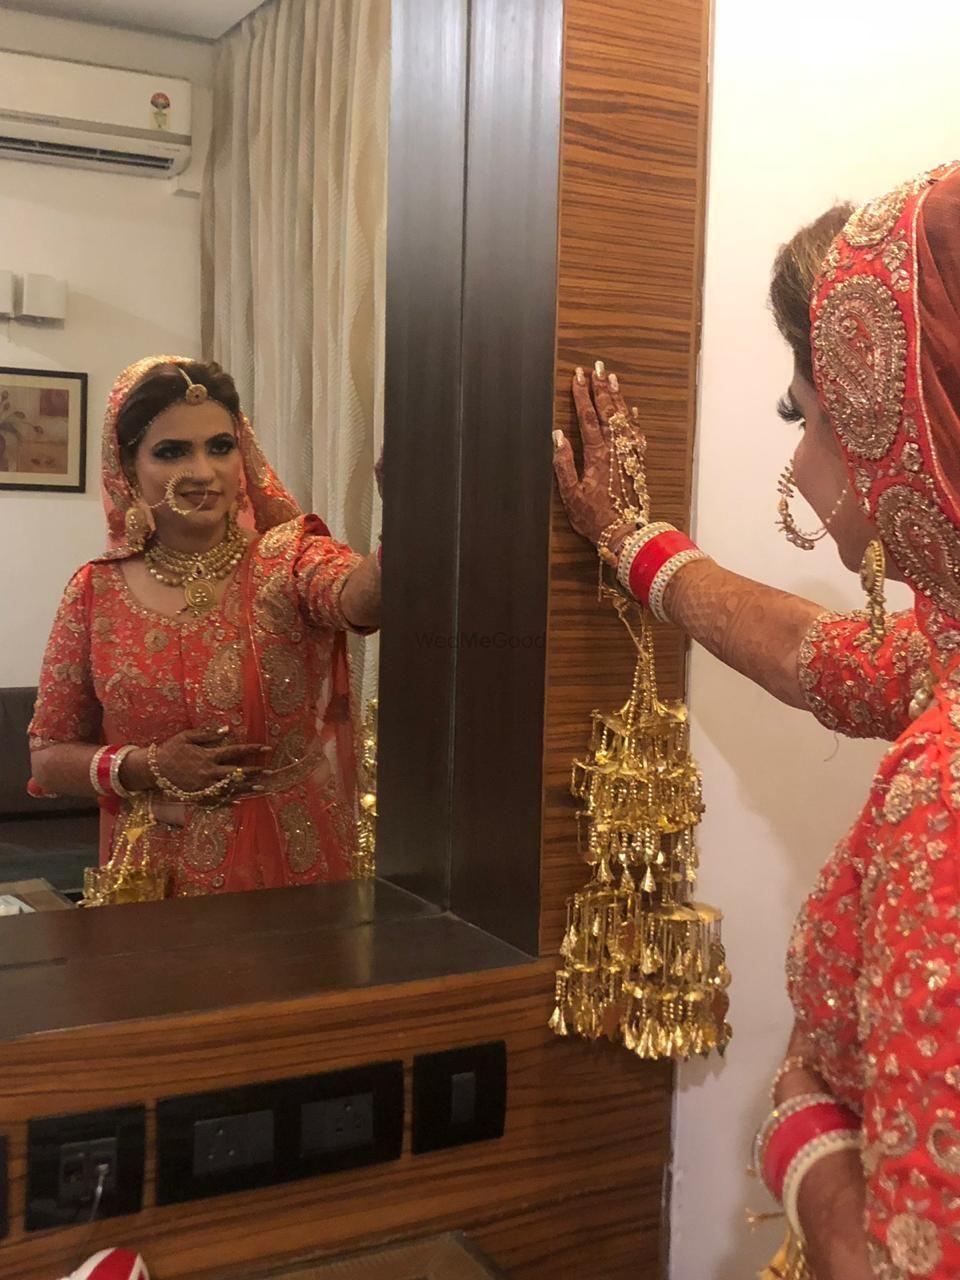 Photo From Swati bridal mehendi on 22nd Nov 2018 at Lily white chattarpur - By Shalini Mehendi Artist